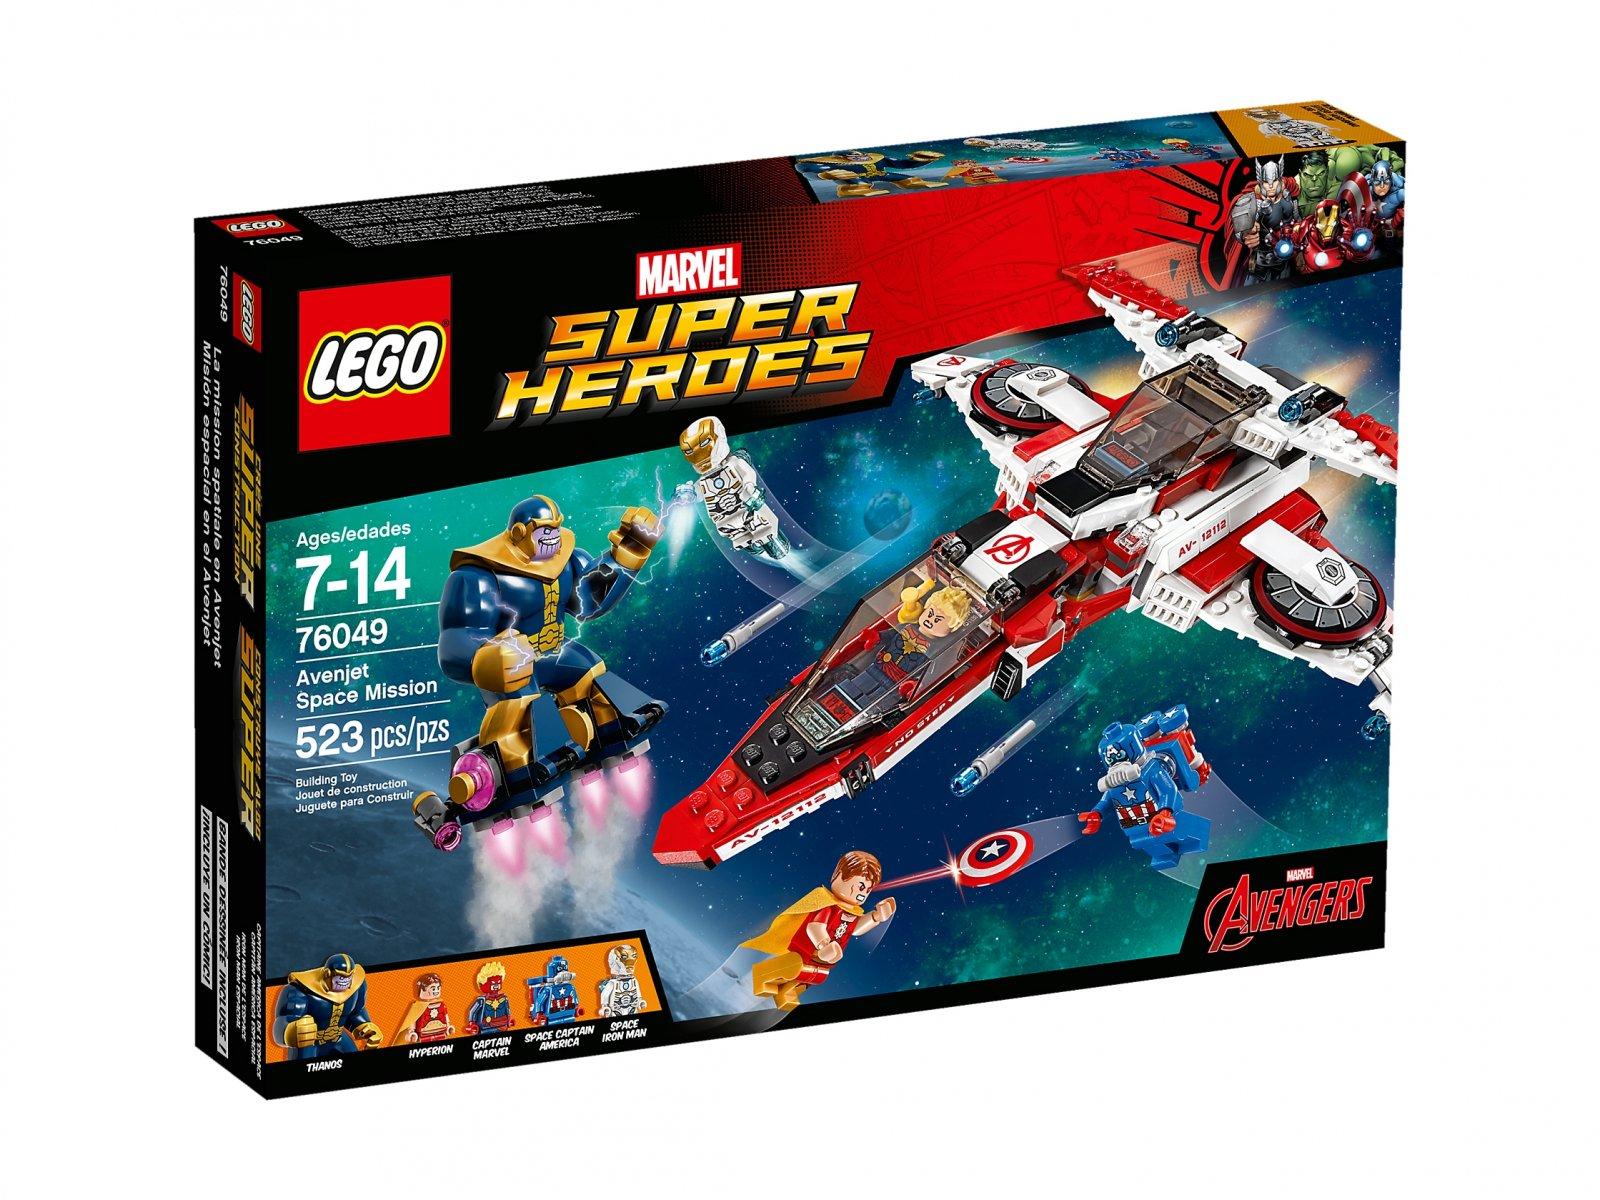 LEGO Marvel Super Heroes Kosmiczna misja